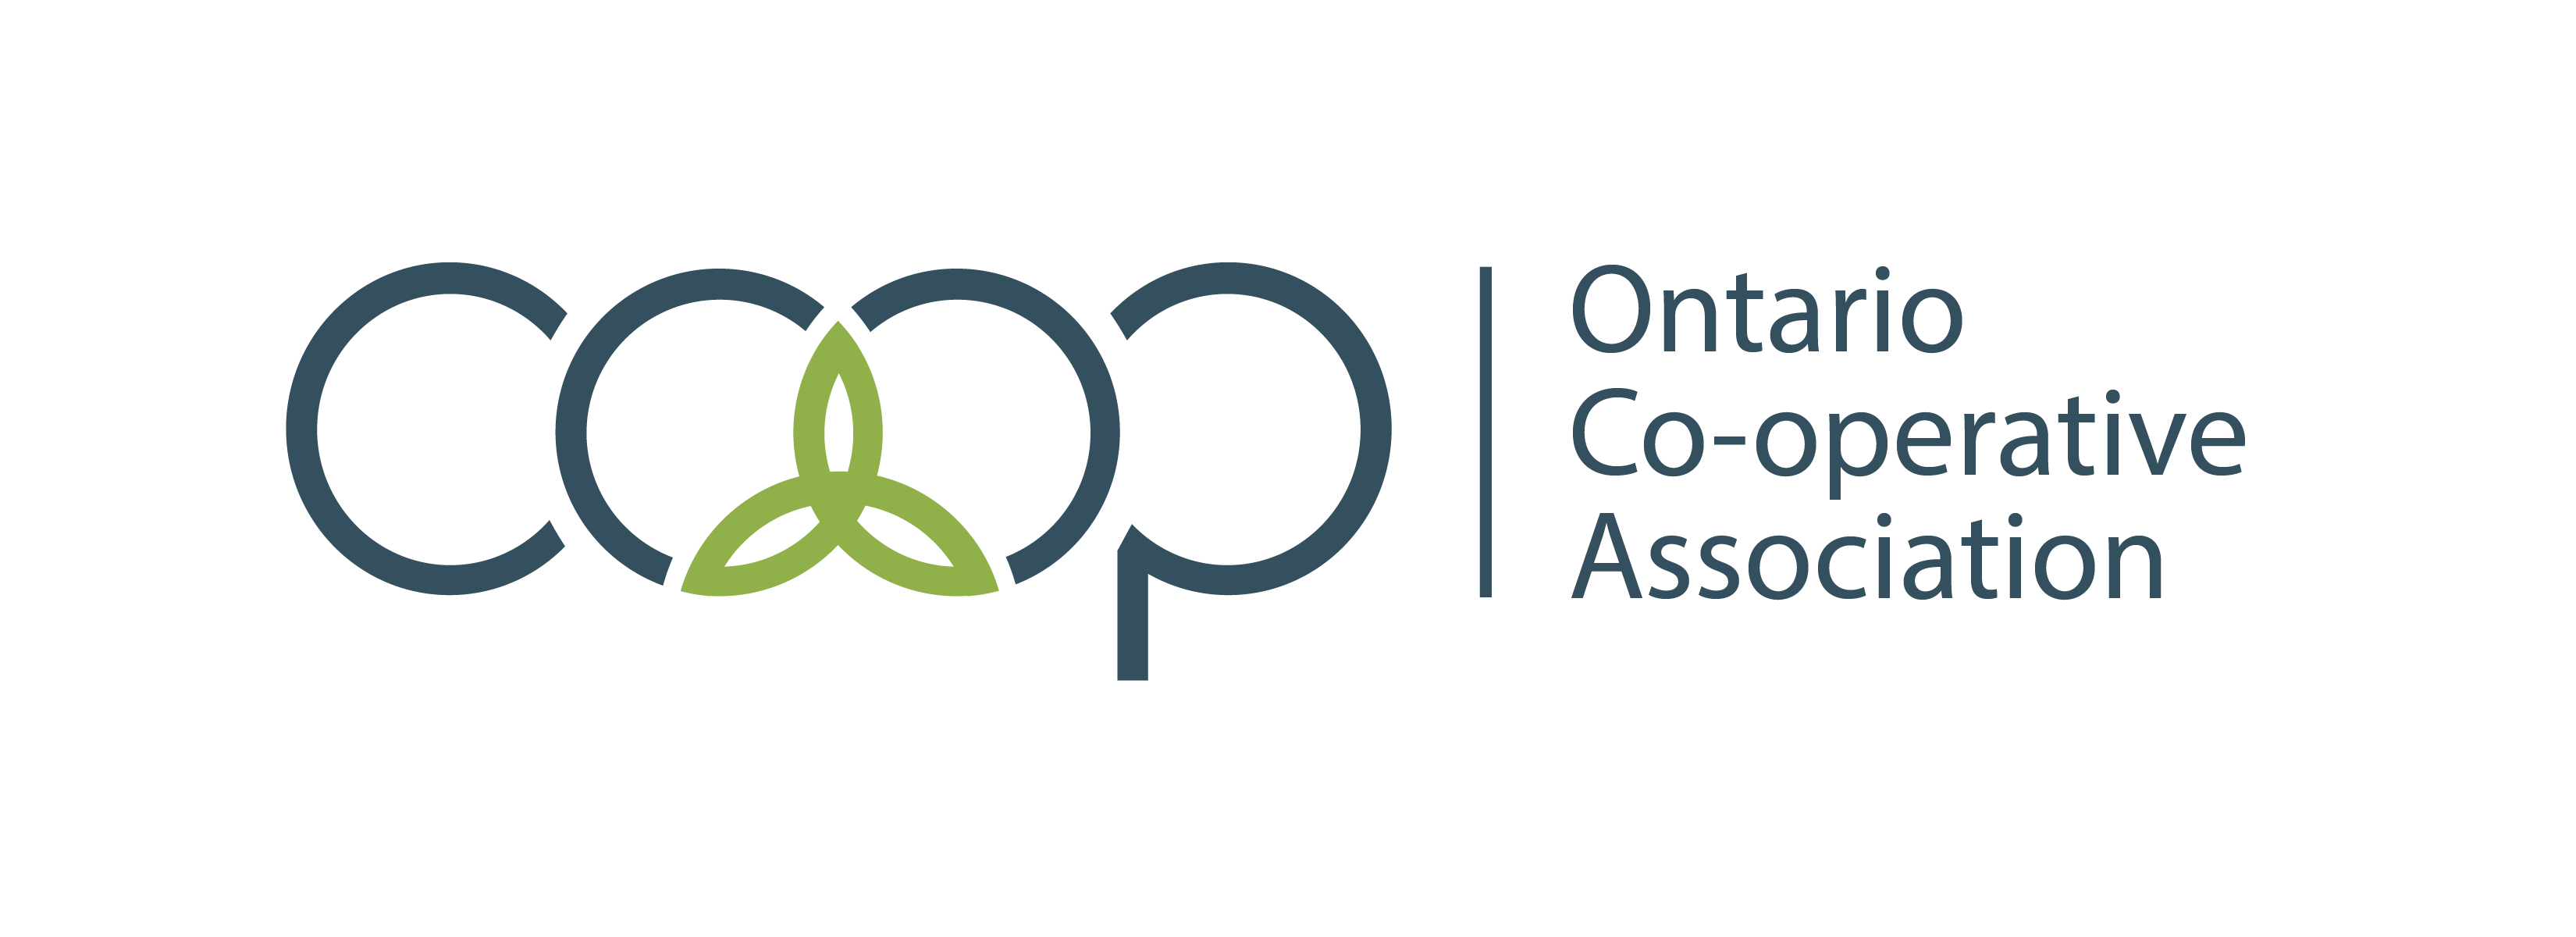 cooperative association software